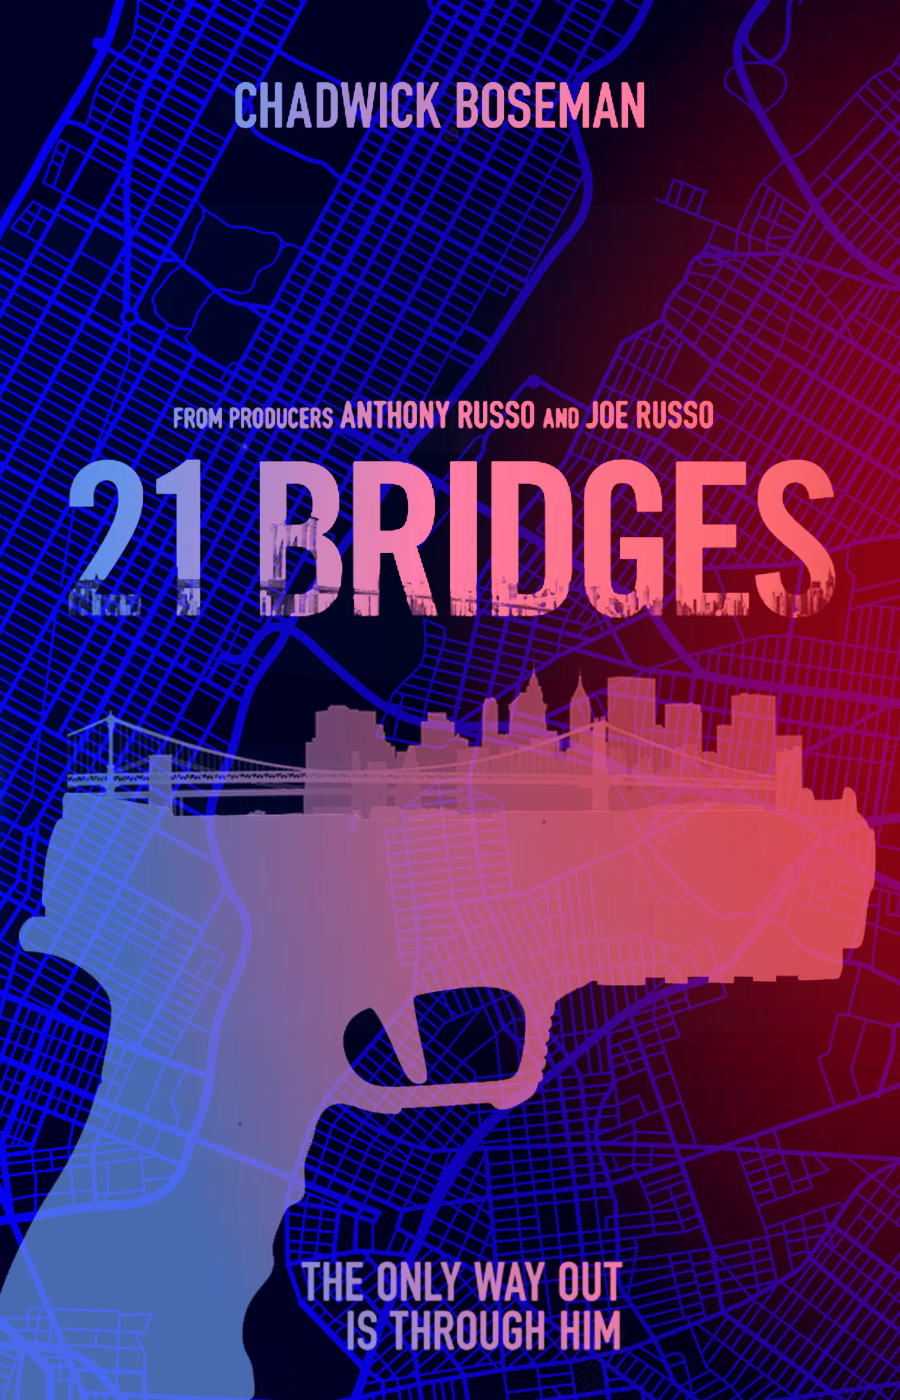 21 Bridges Movie Poster By Dcomp On Deviantart